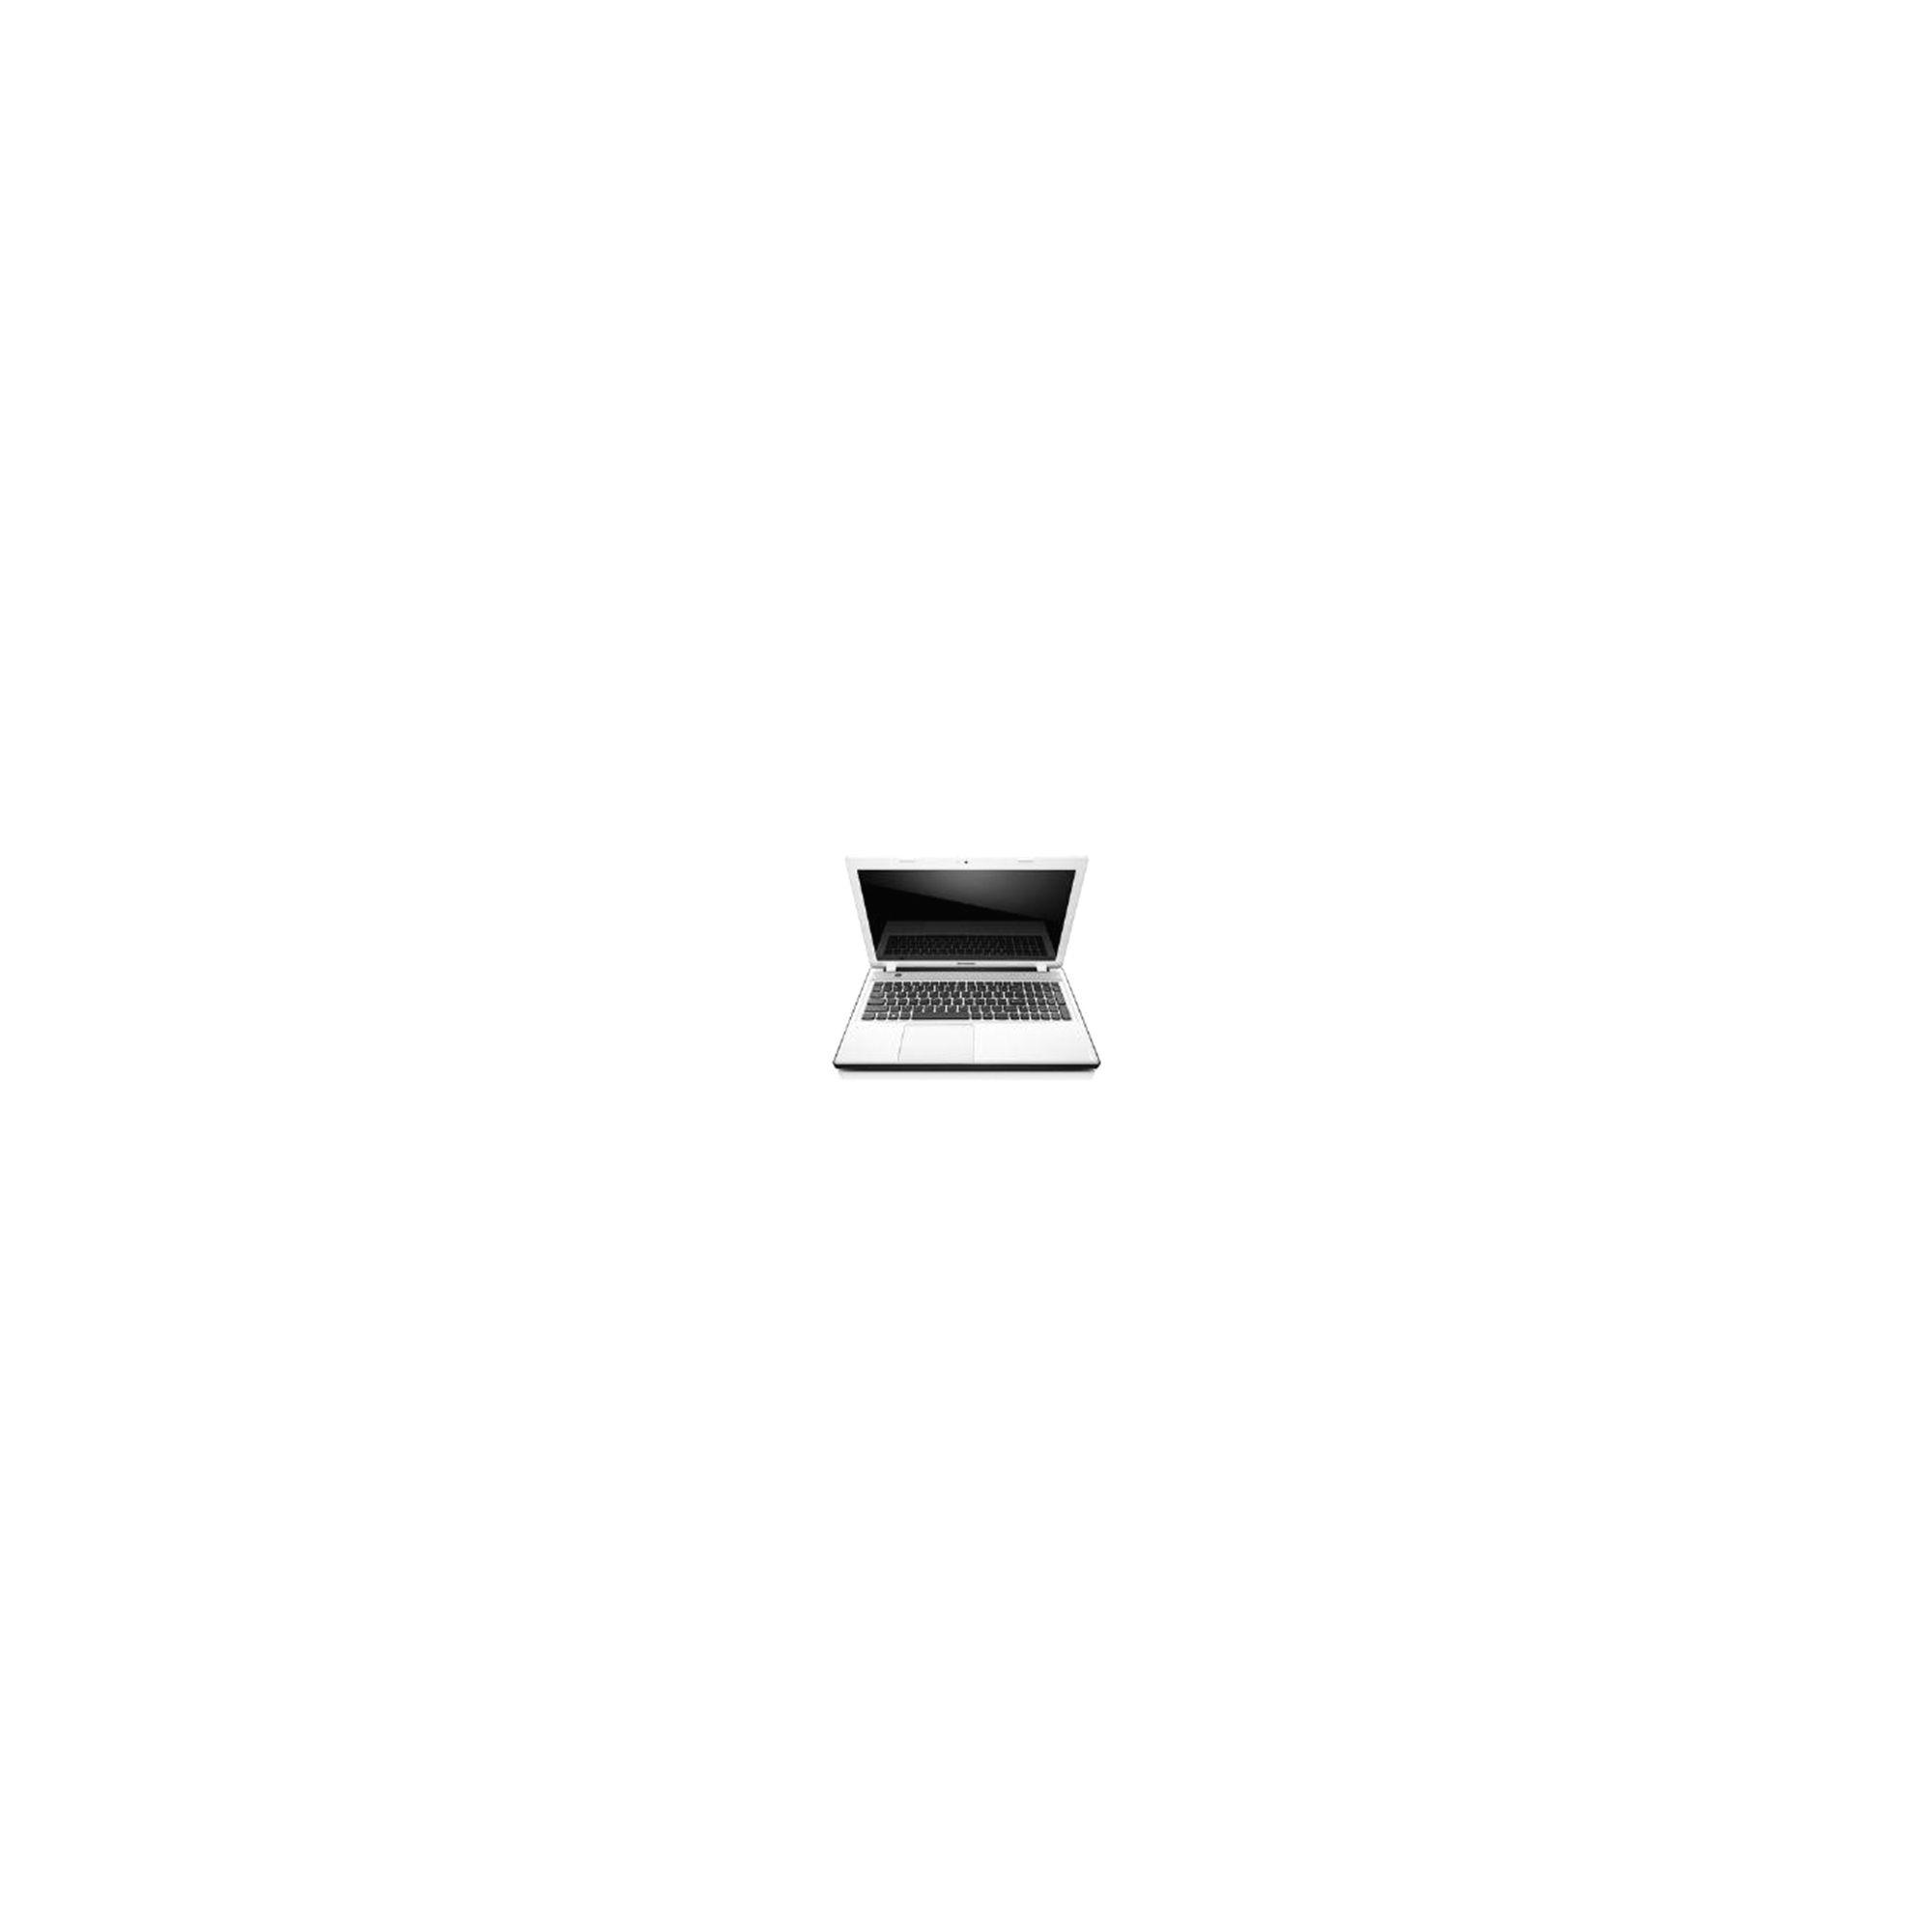 Lenovo IdeaPad Z580 2151KKG (15.6 inch) Notebook Core i5 (3230M) 2.6GHz 8GB 1TB DVD±RW WLAN Webcam Windows 8 (nVidia GeForce GT 635M) White at Tesco Direct